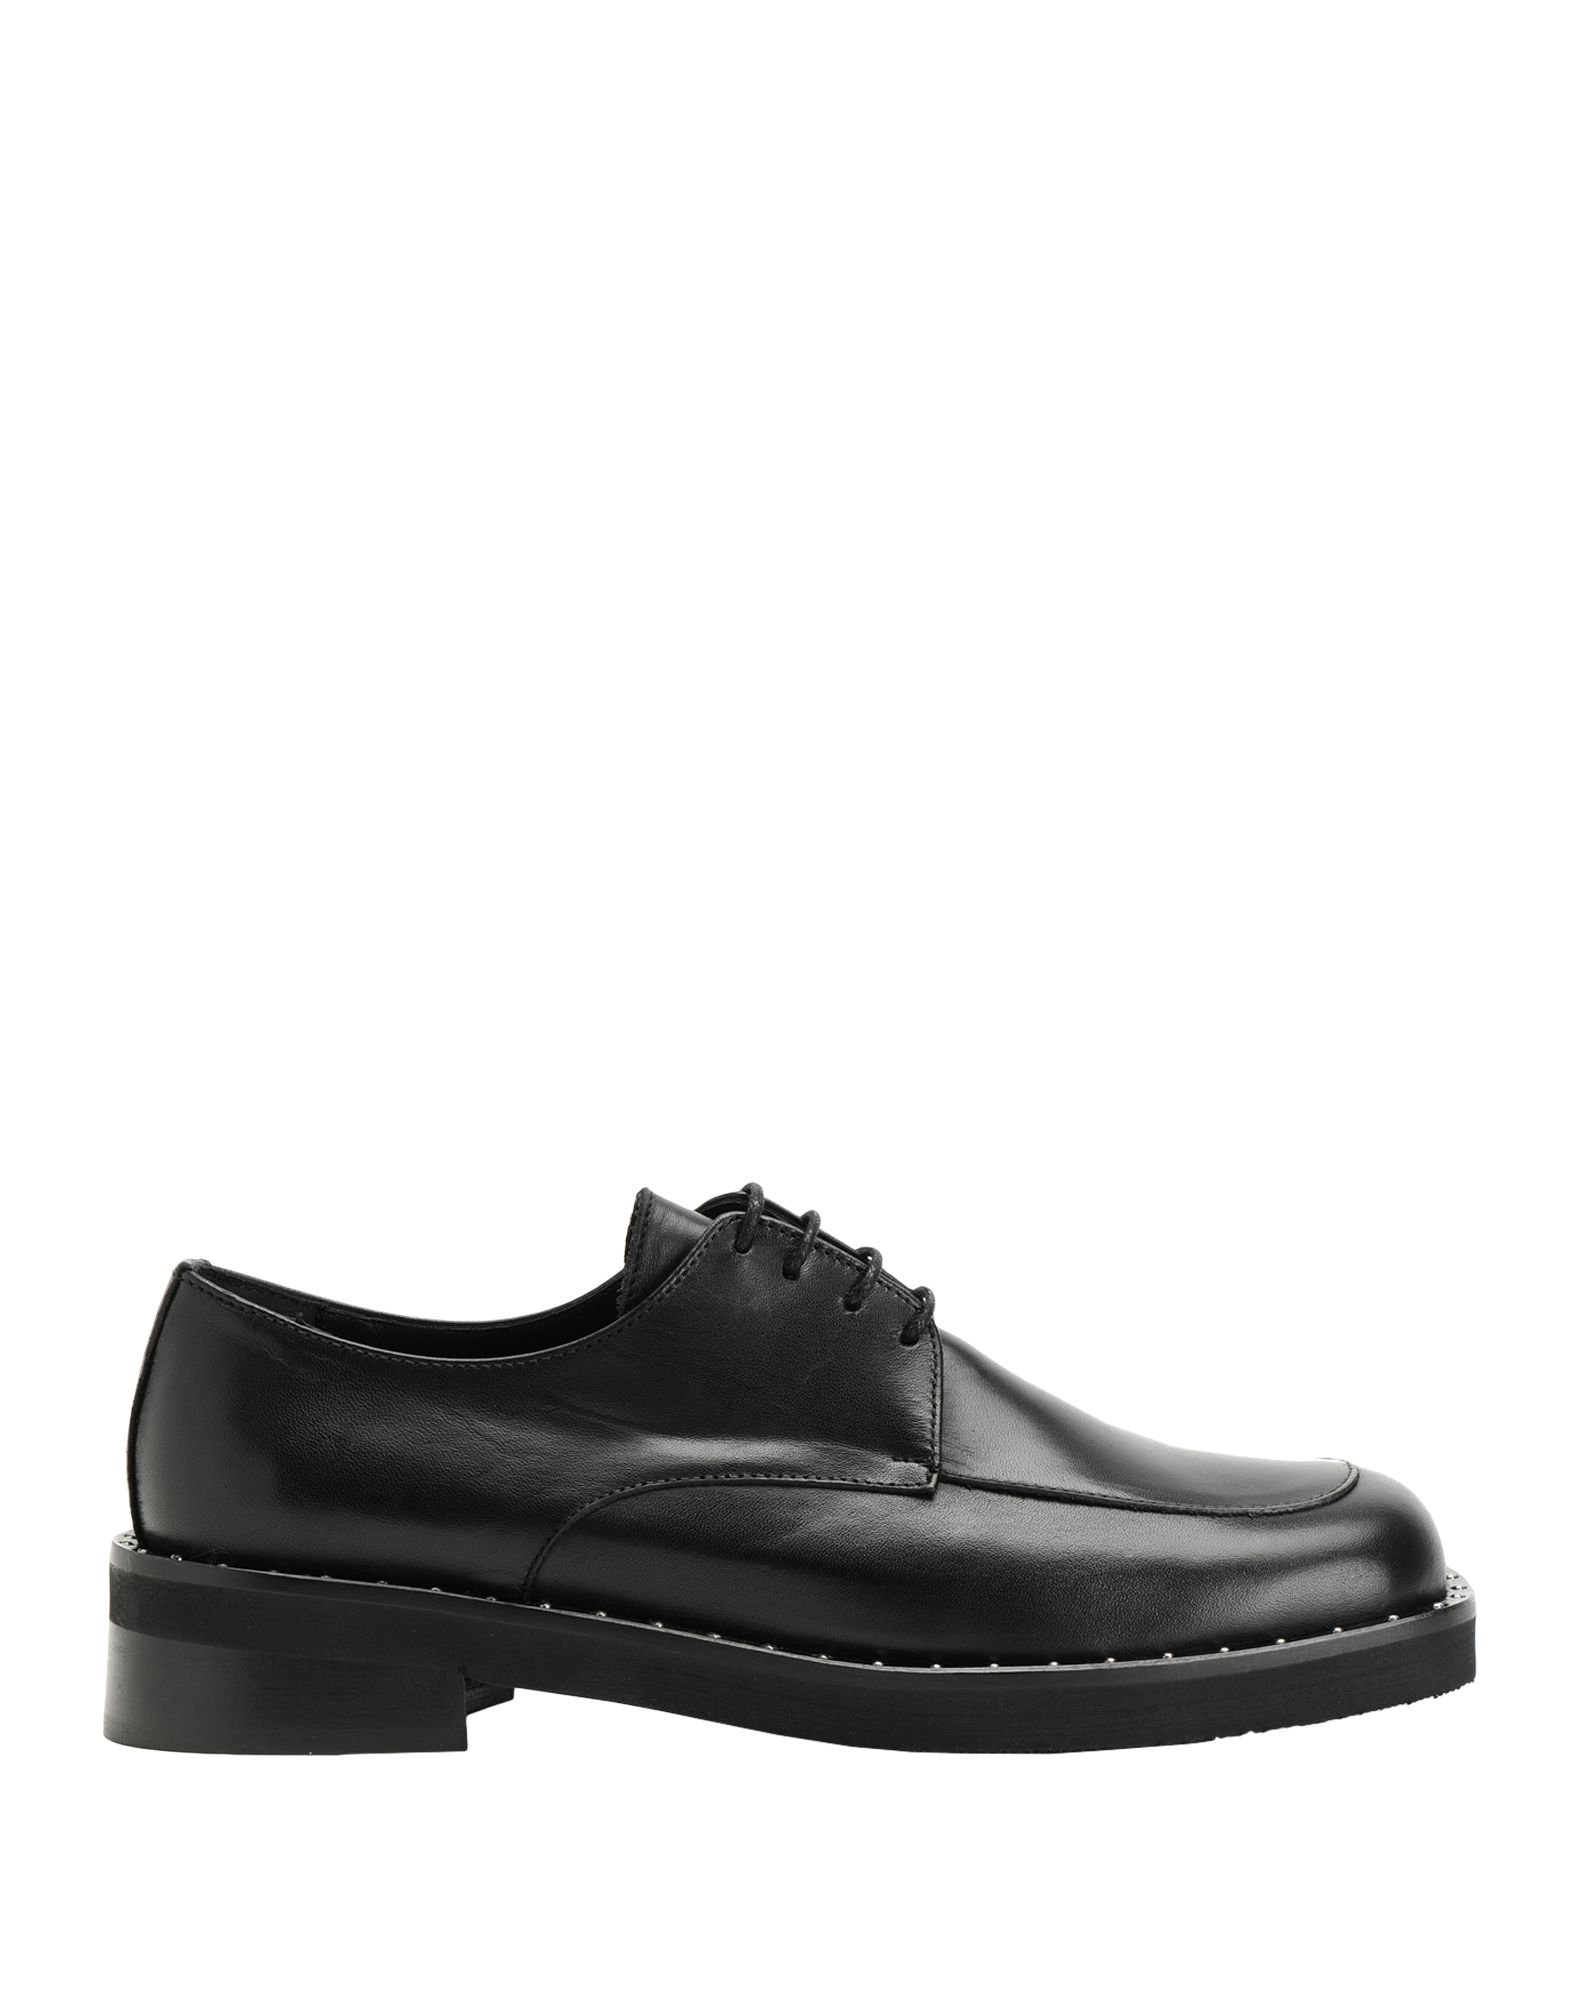 8 by YOOX Обувь на шнурках claudia by isaberi обувь на шнурках